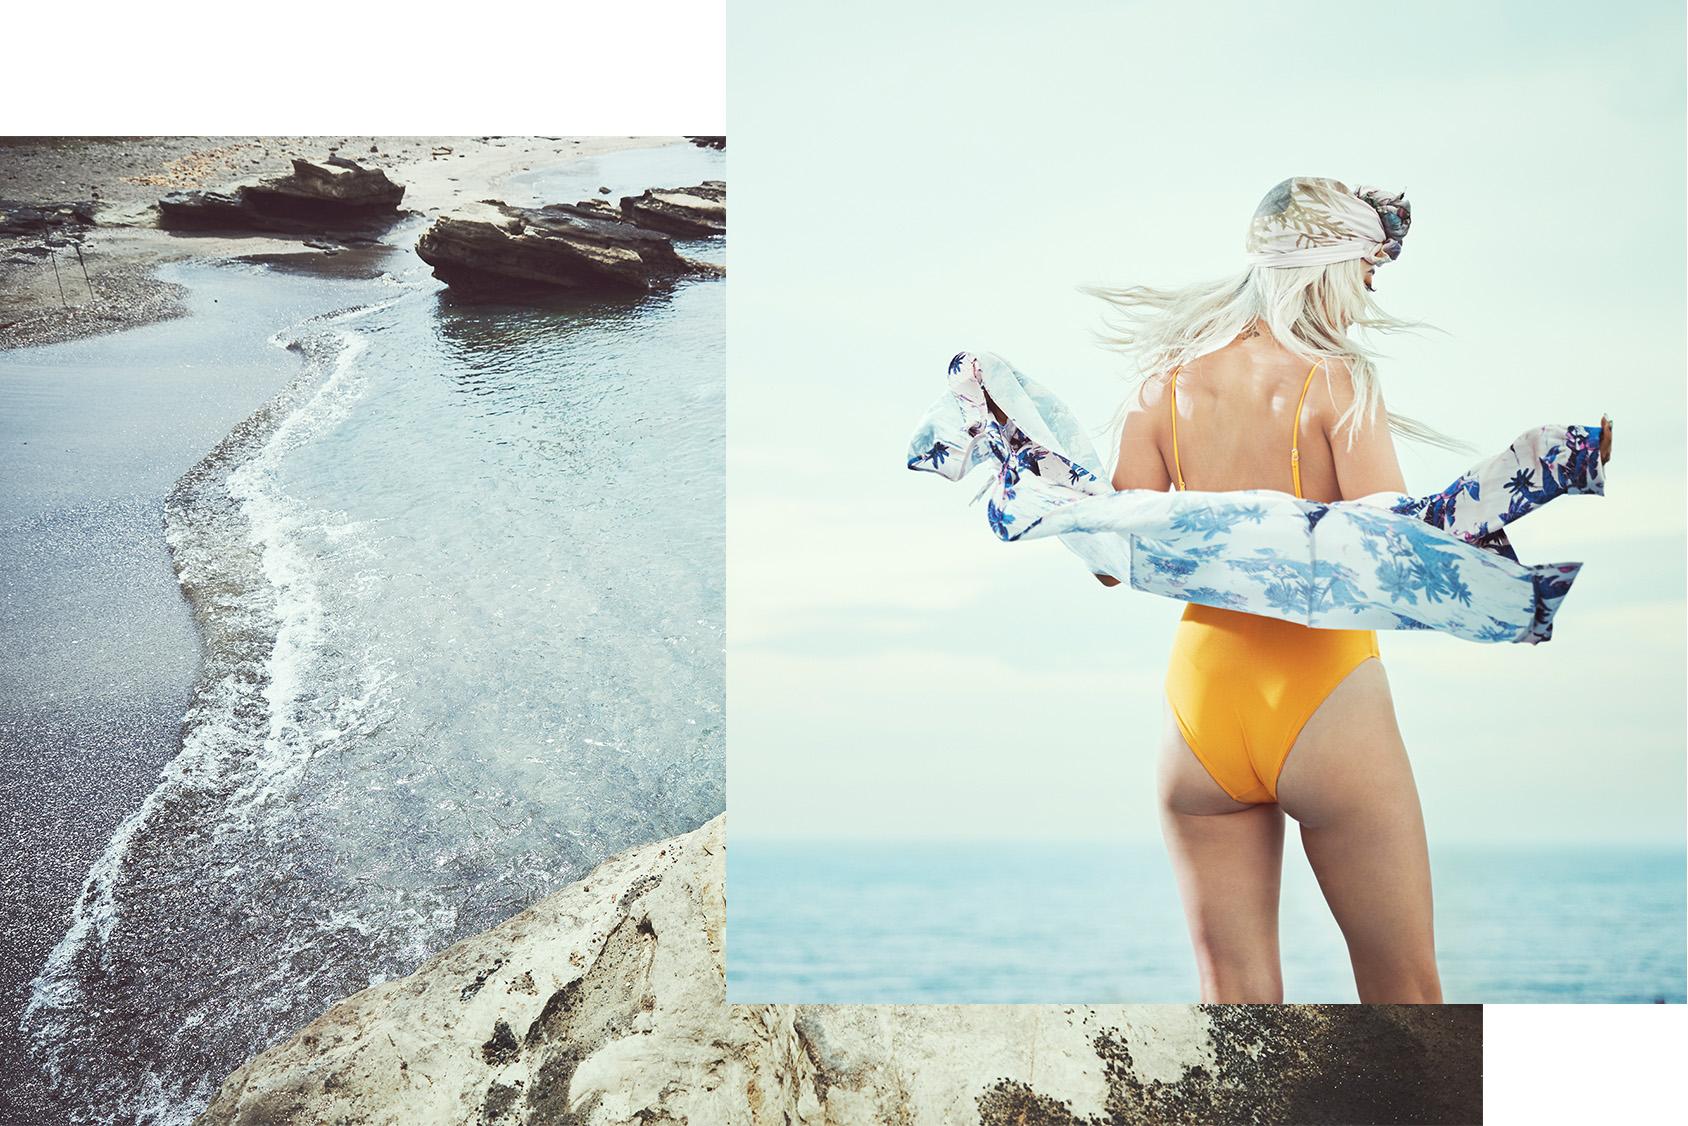 ALISA UENO'S JAPANESE SUMMER BEACH SPOT